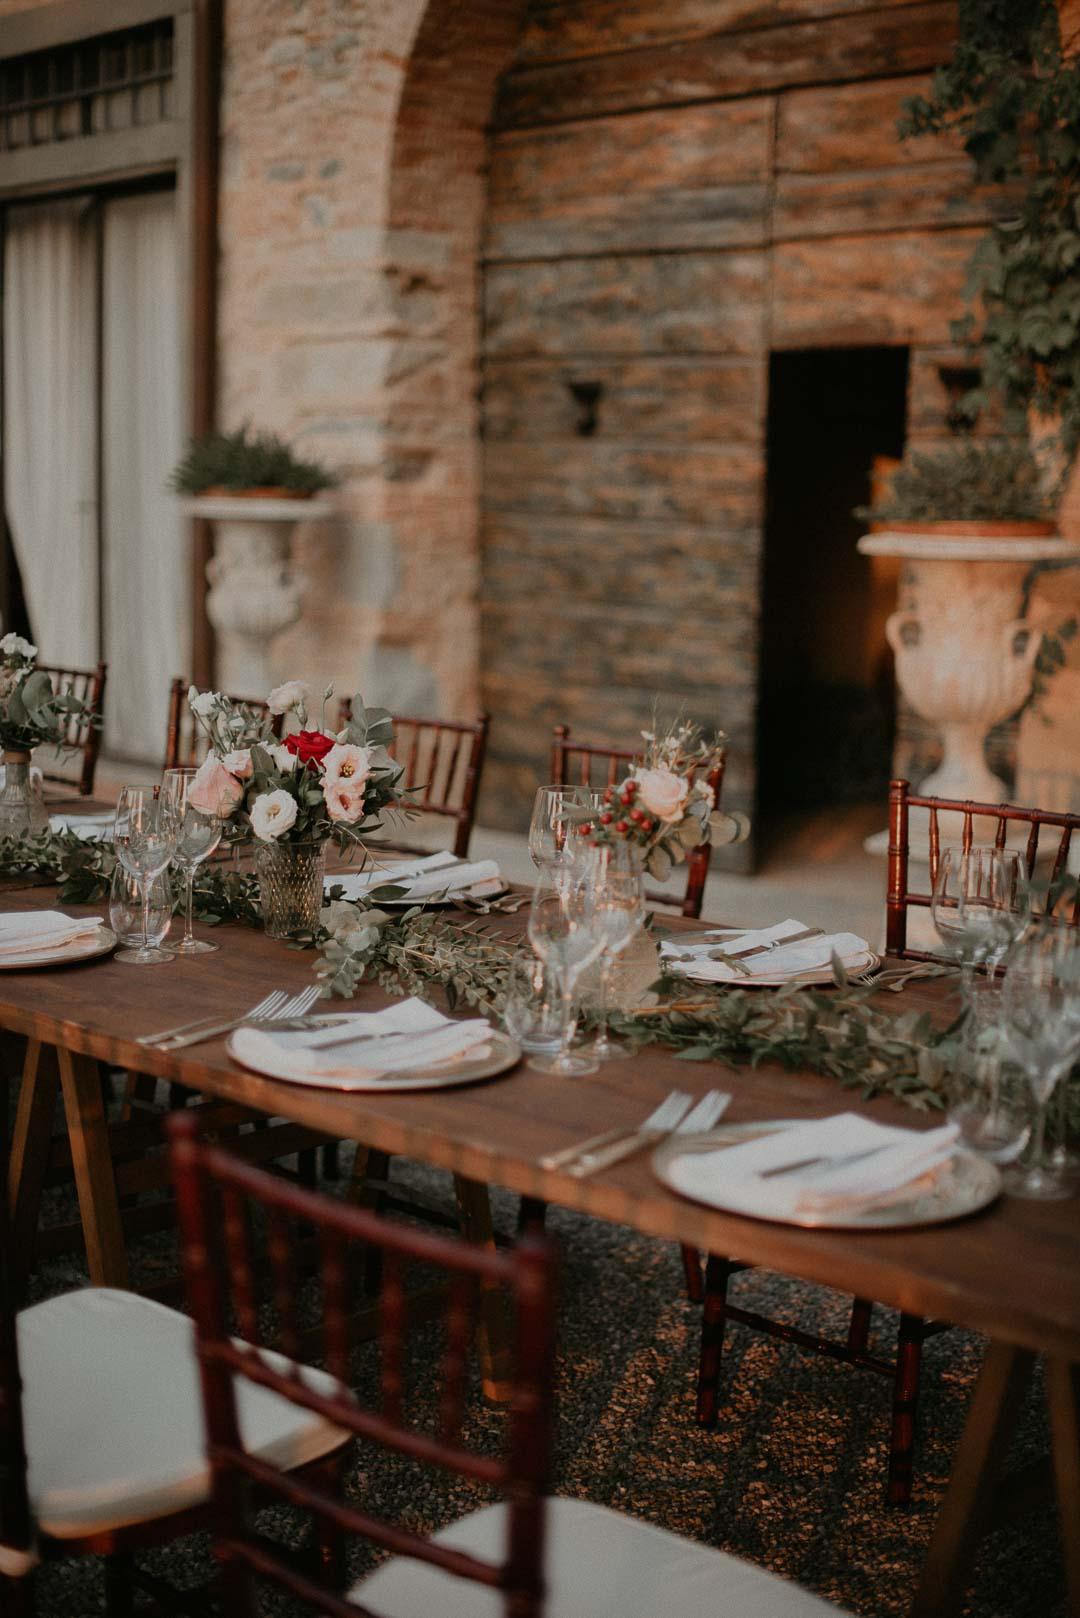 wedding-photographer-destination-fineart-bespoke-reportage-tuscany-villascorzi-vivianeizzo-spazio46-144